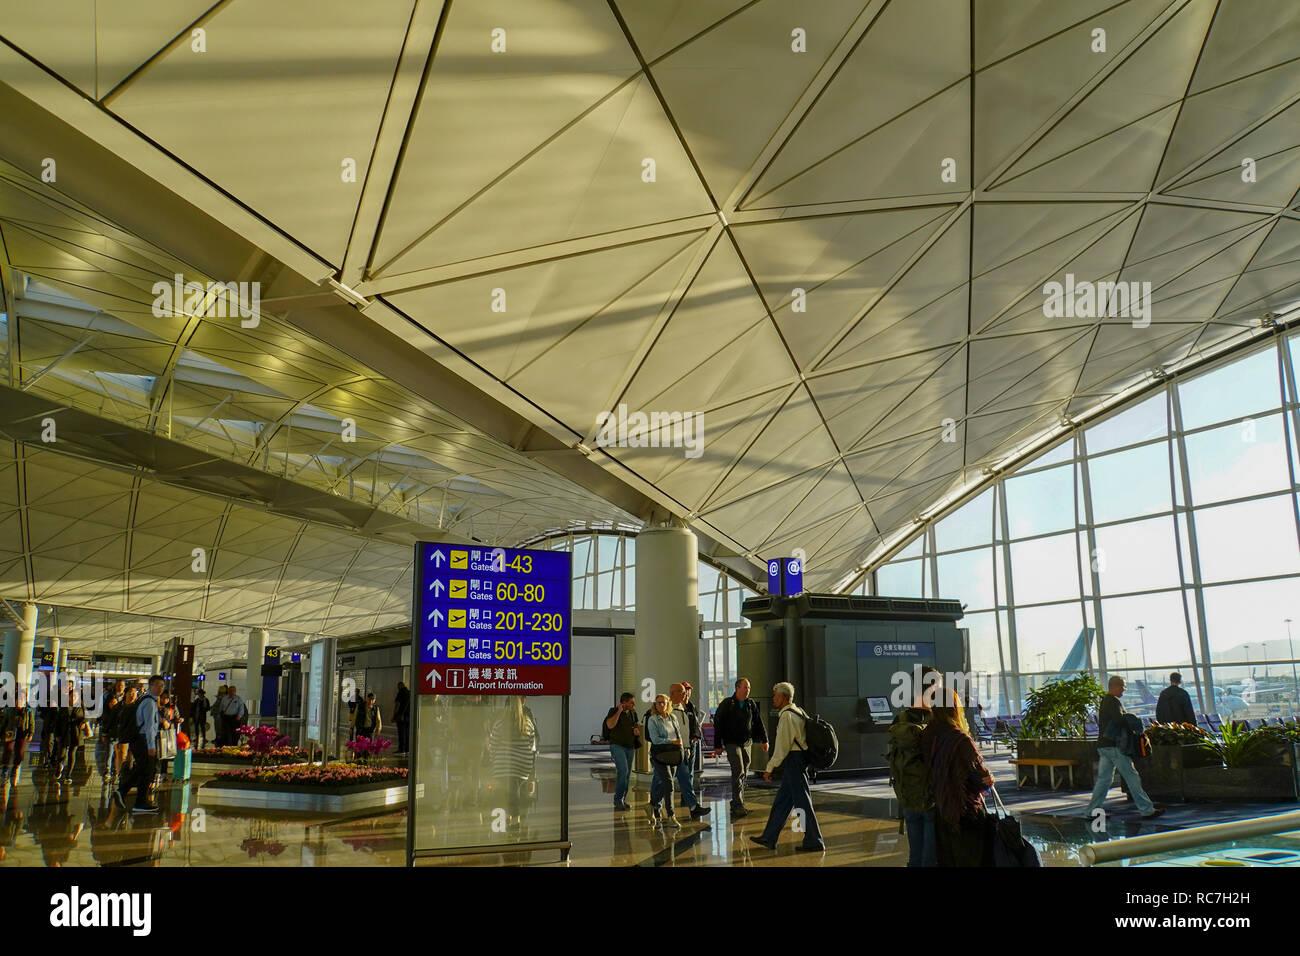 Asia, Southeast, People's Republic of China, Hong Kong, people waiting for the flight at Hong Kong international airport. - Stock Image